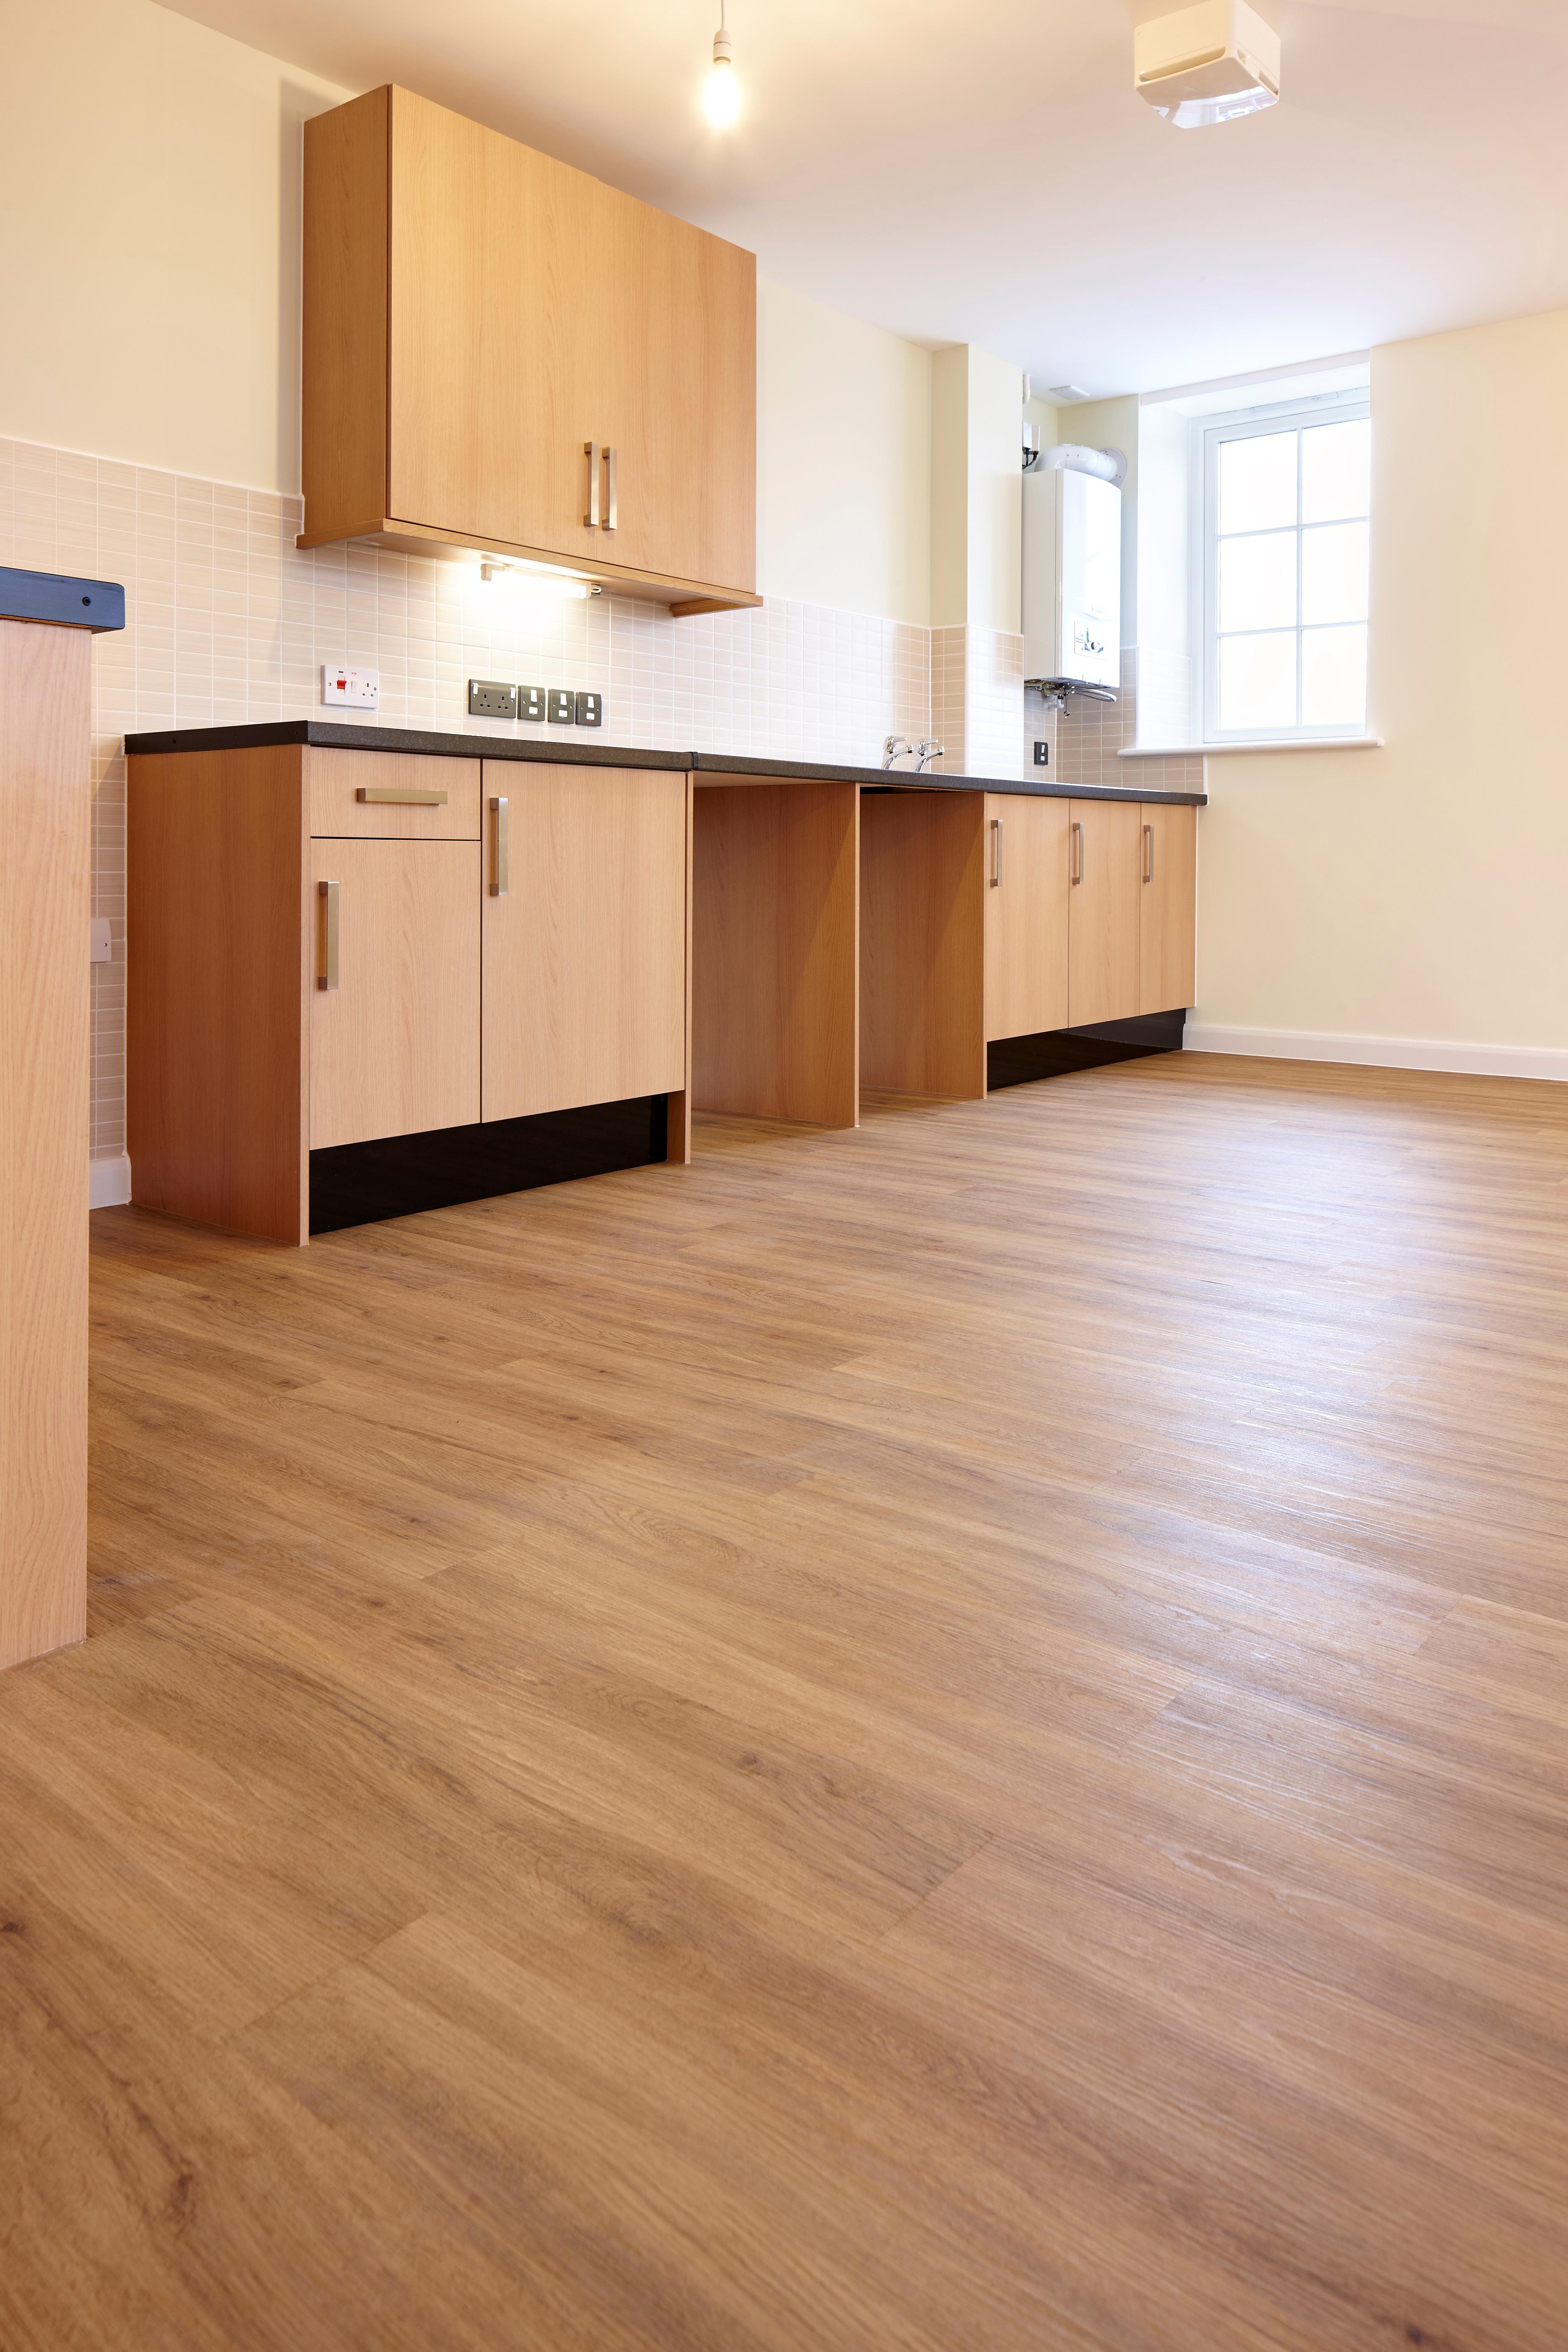 34178_34178_Rhondda-Housing-Image-1.jpg